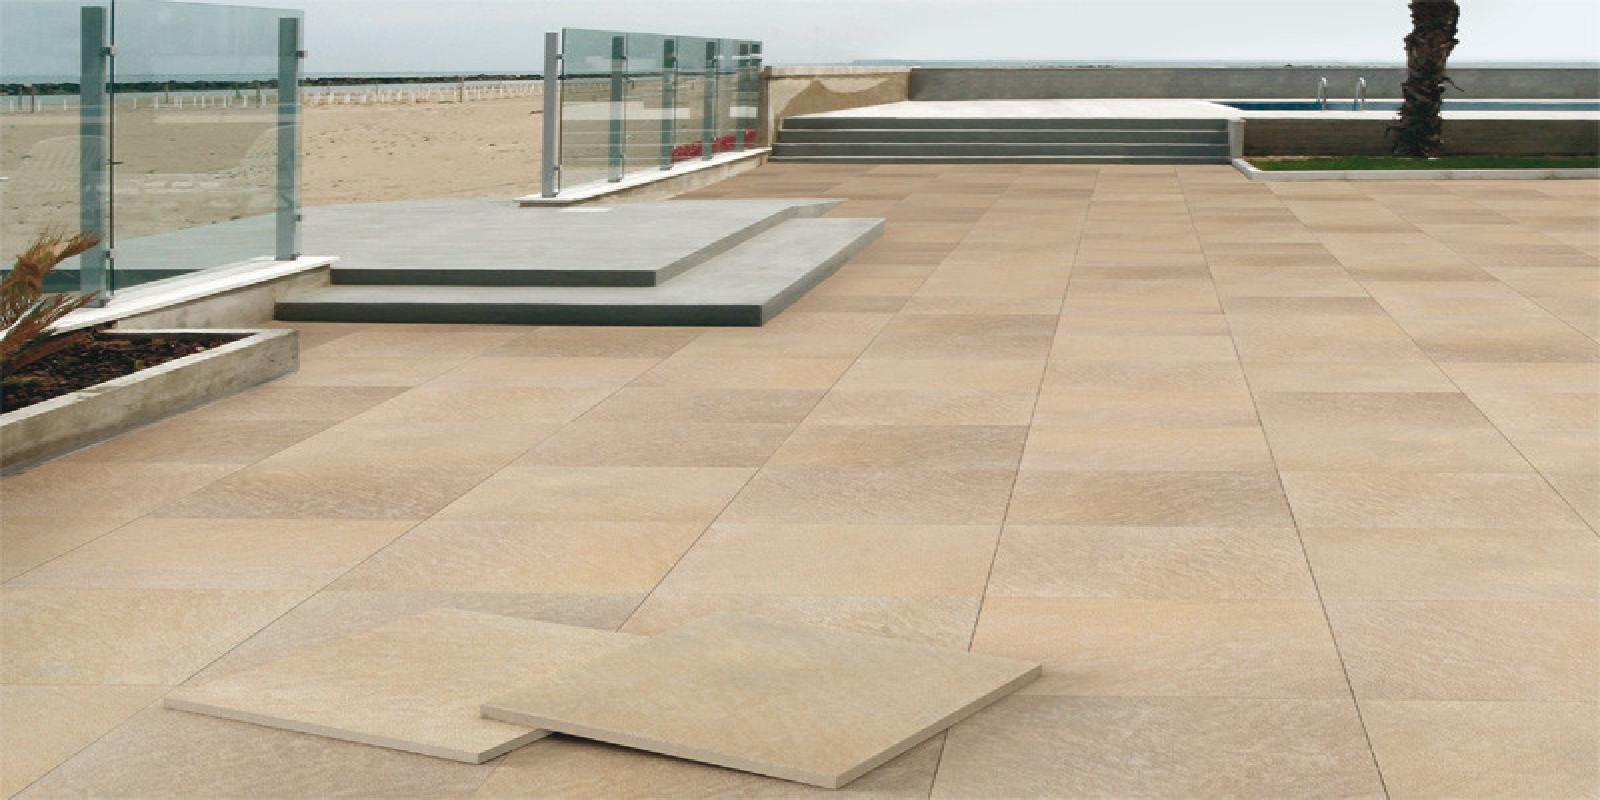 Pavimenti per esterni piastrelle sottili posa su pavimenti - Materiale per piastrelle ...